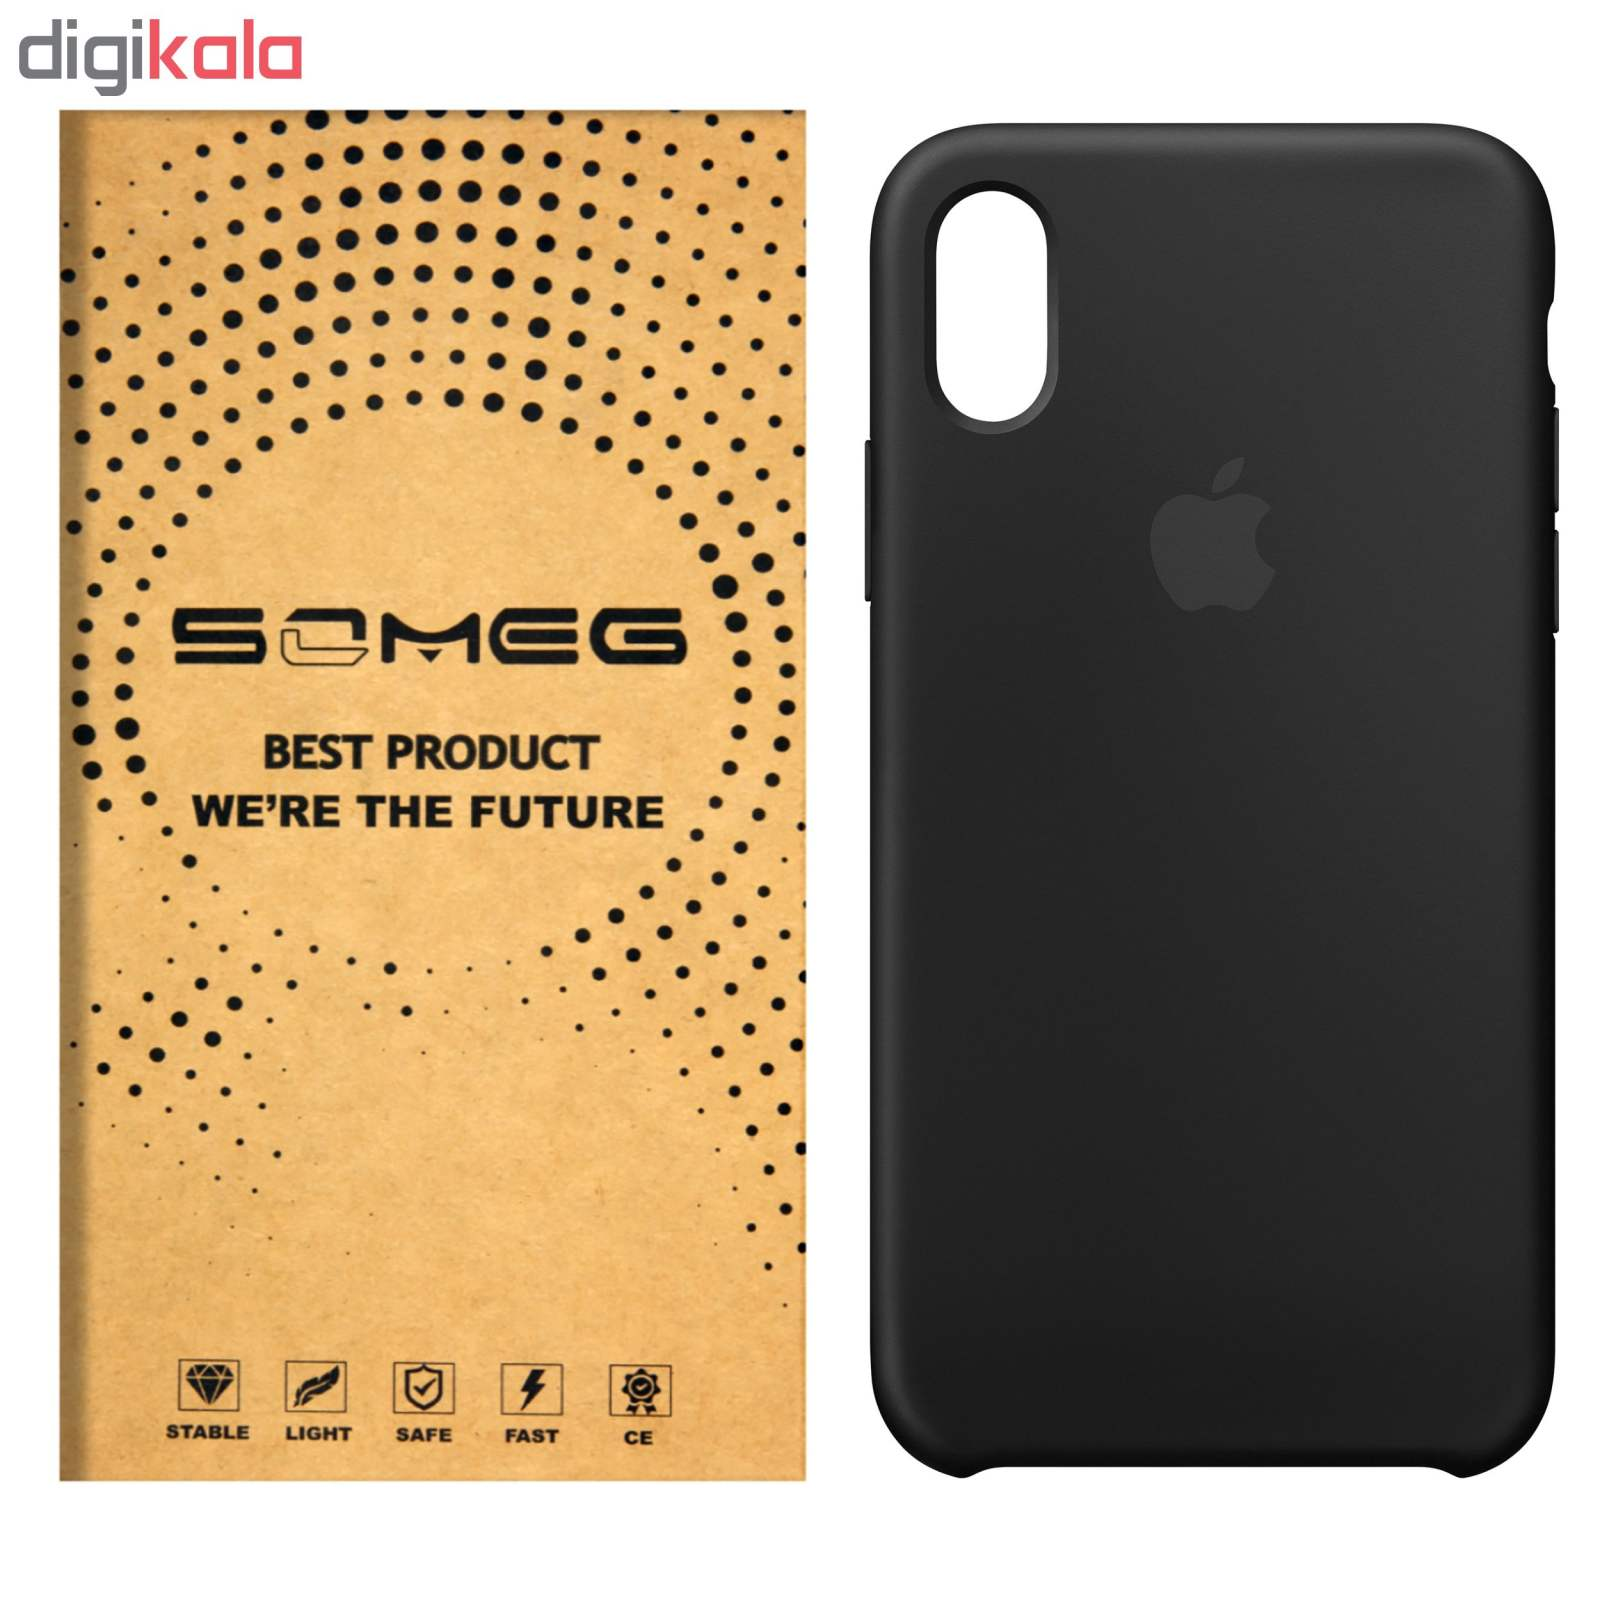 کاور سومگ مدل SIC مناسب برای گوشی موبایل اپل iPhone X  main 1 1